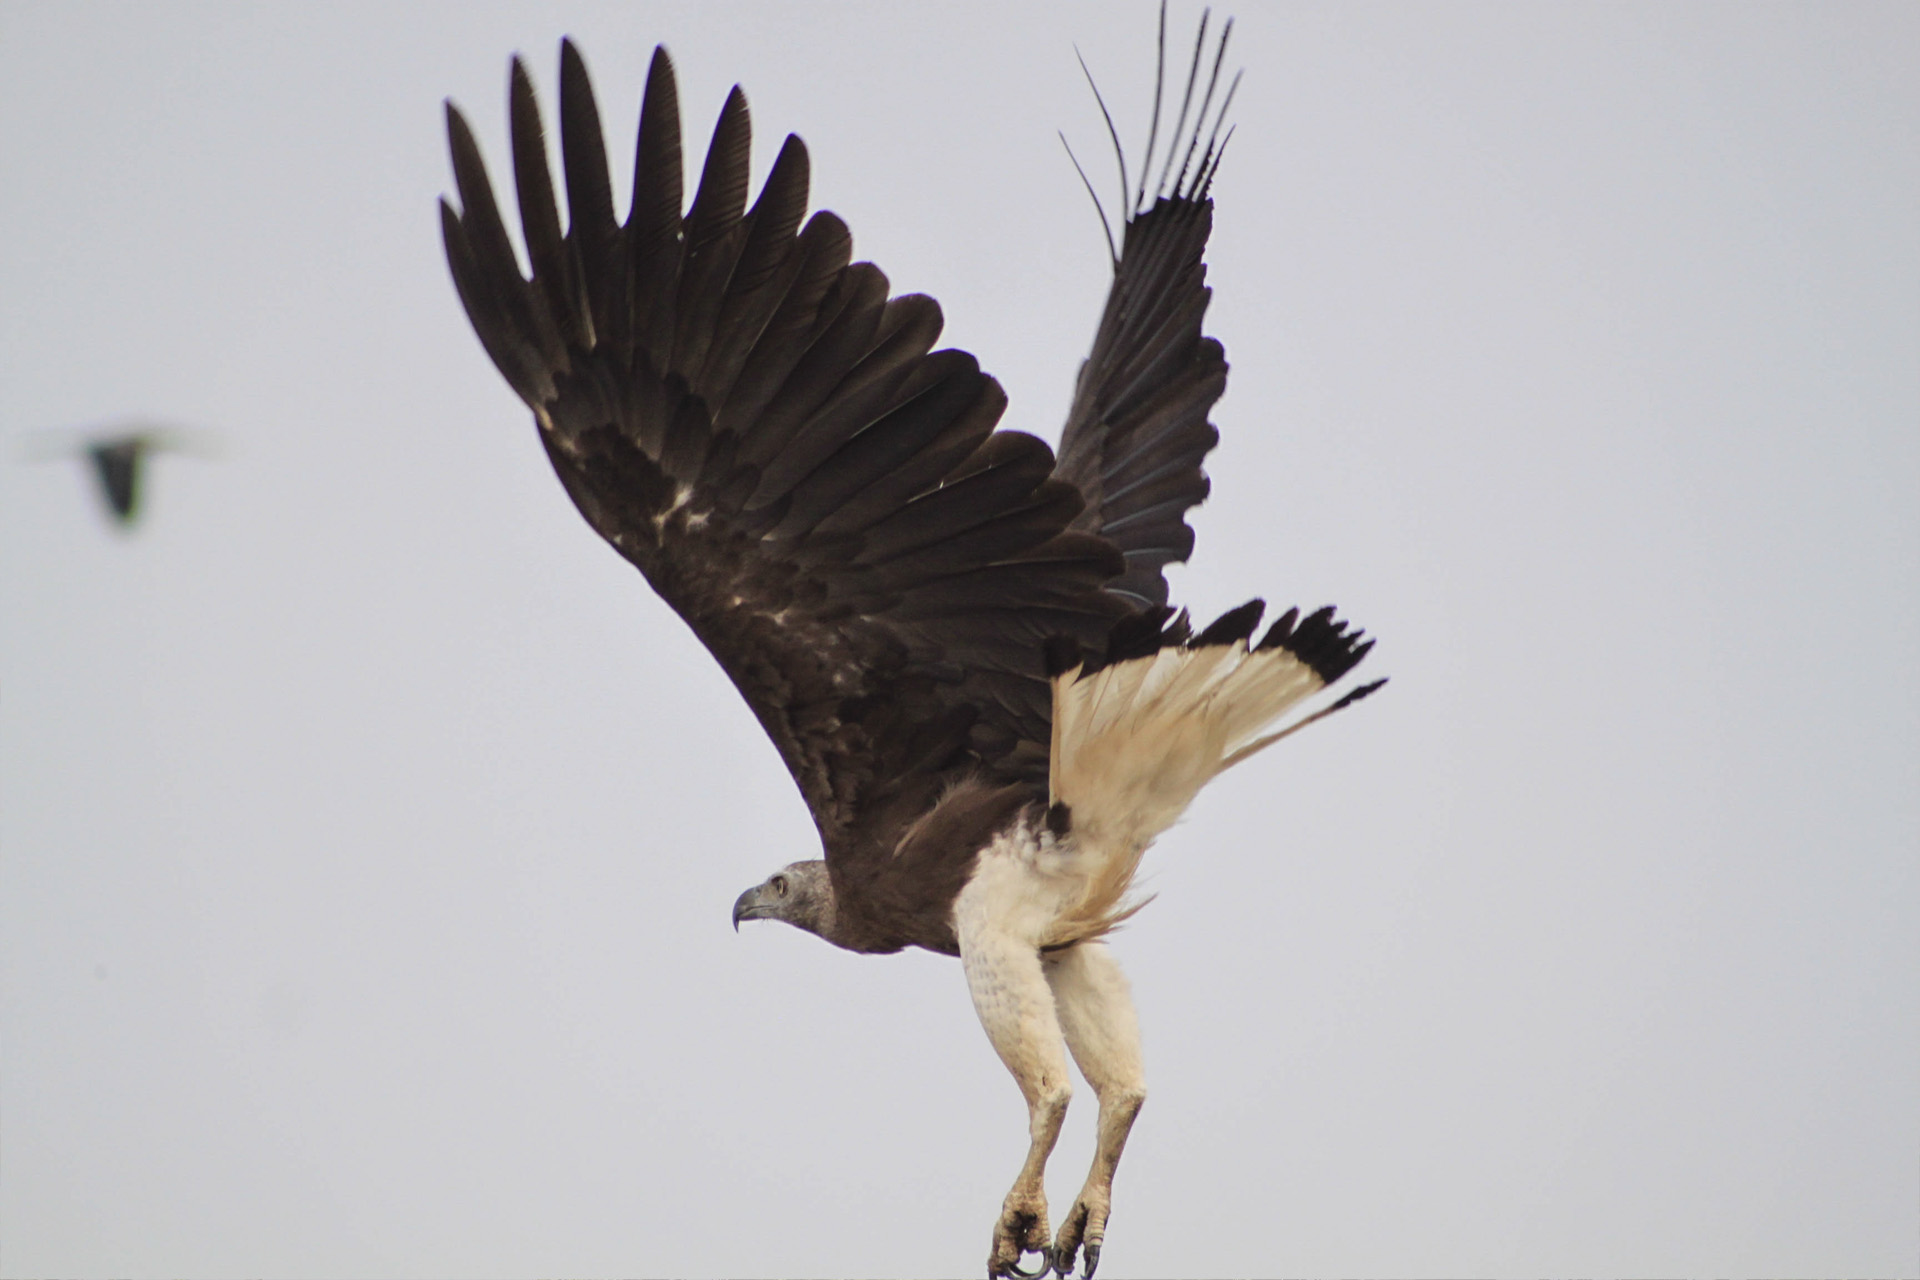 Grey-headed Fish-eagle